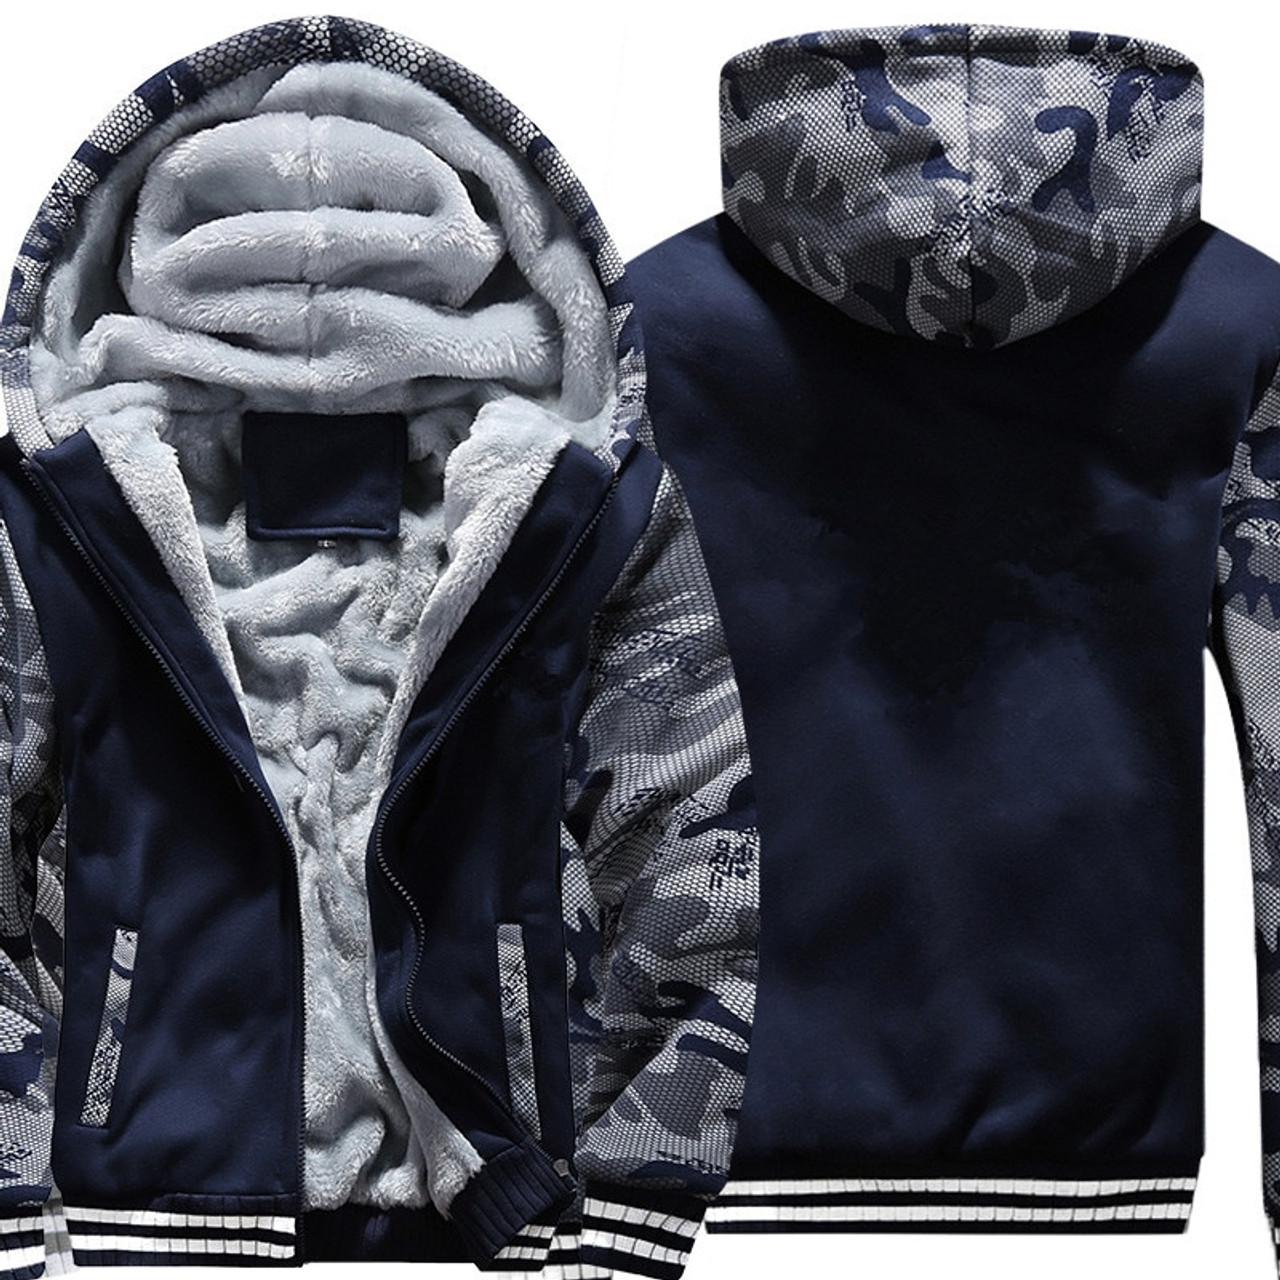 0f57afcda2dd US/EU SIZE Super Warm Hoodies Sweatshirts for Men Winter Thick Fleece Men's  Jackets Casual ...